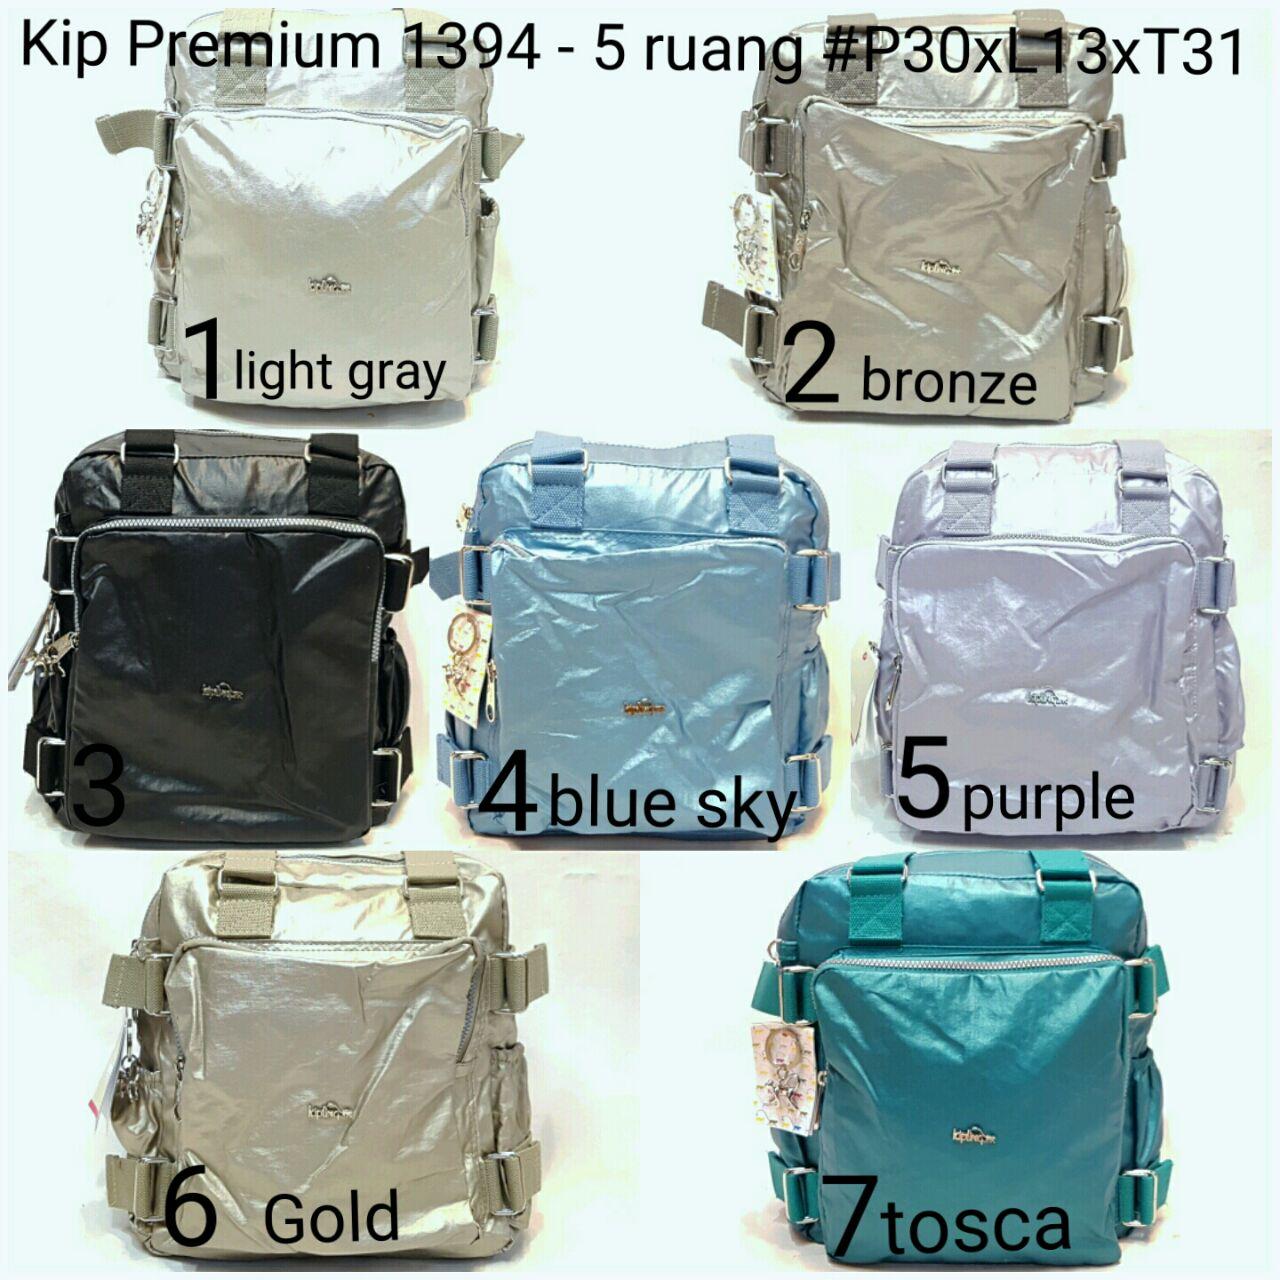 Kipling metallic 3in1 1394 PREMIUM bisa tenteng 5613ec8d2d